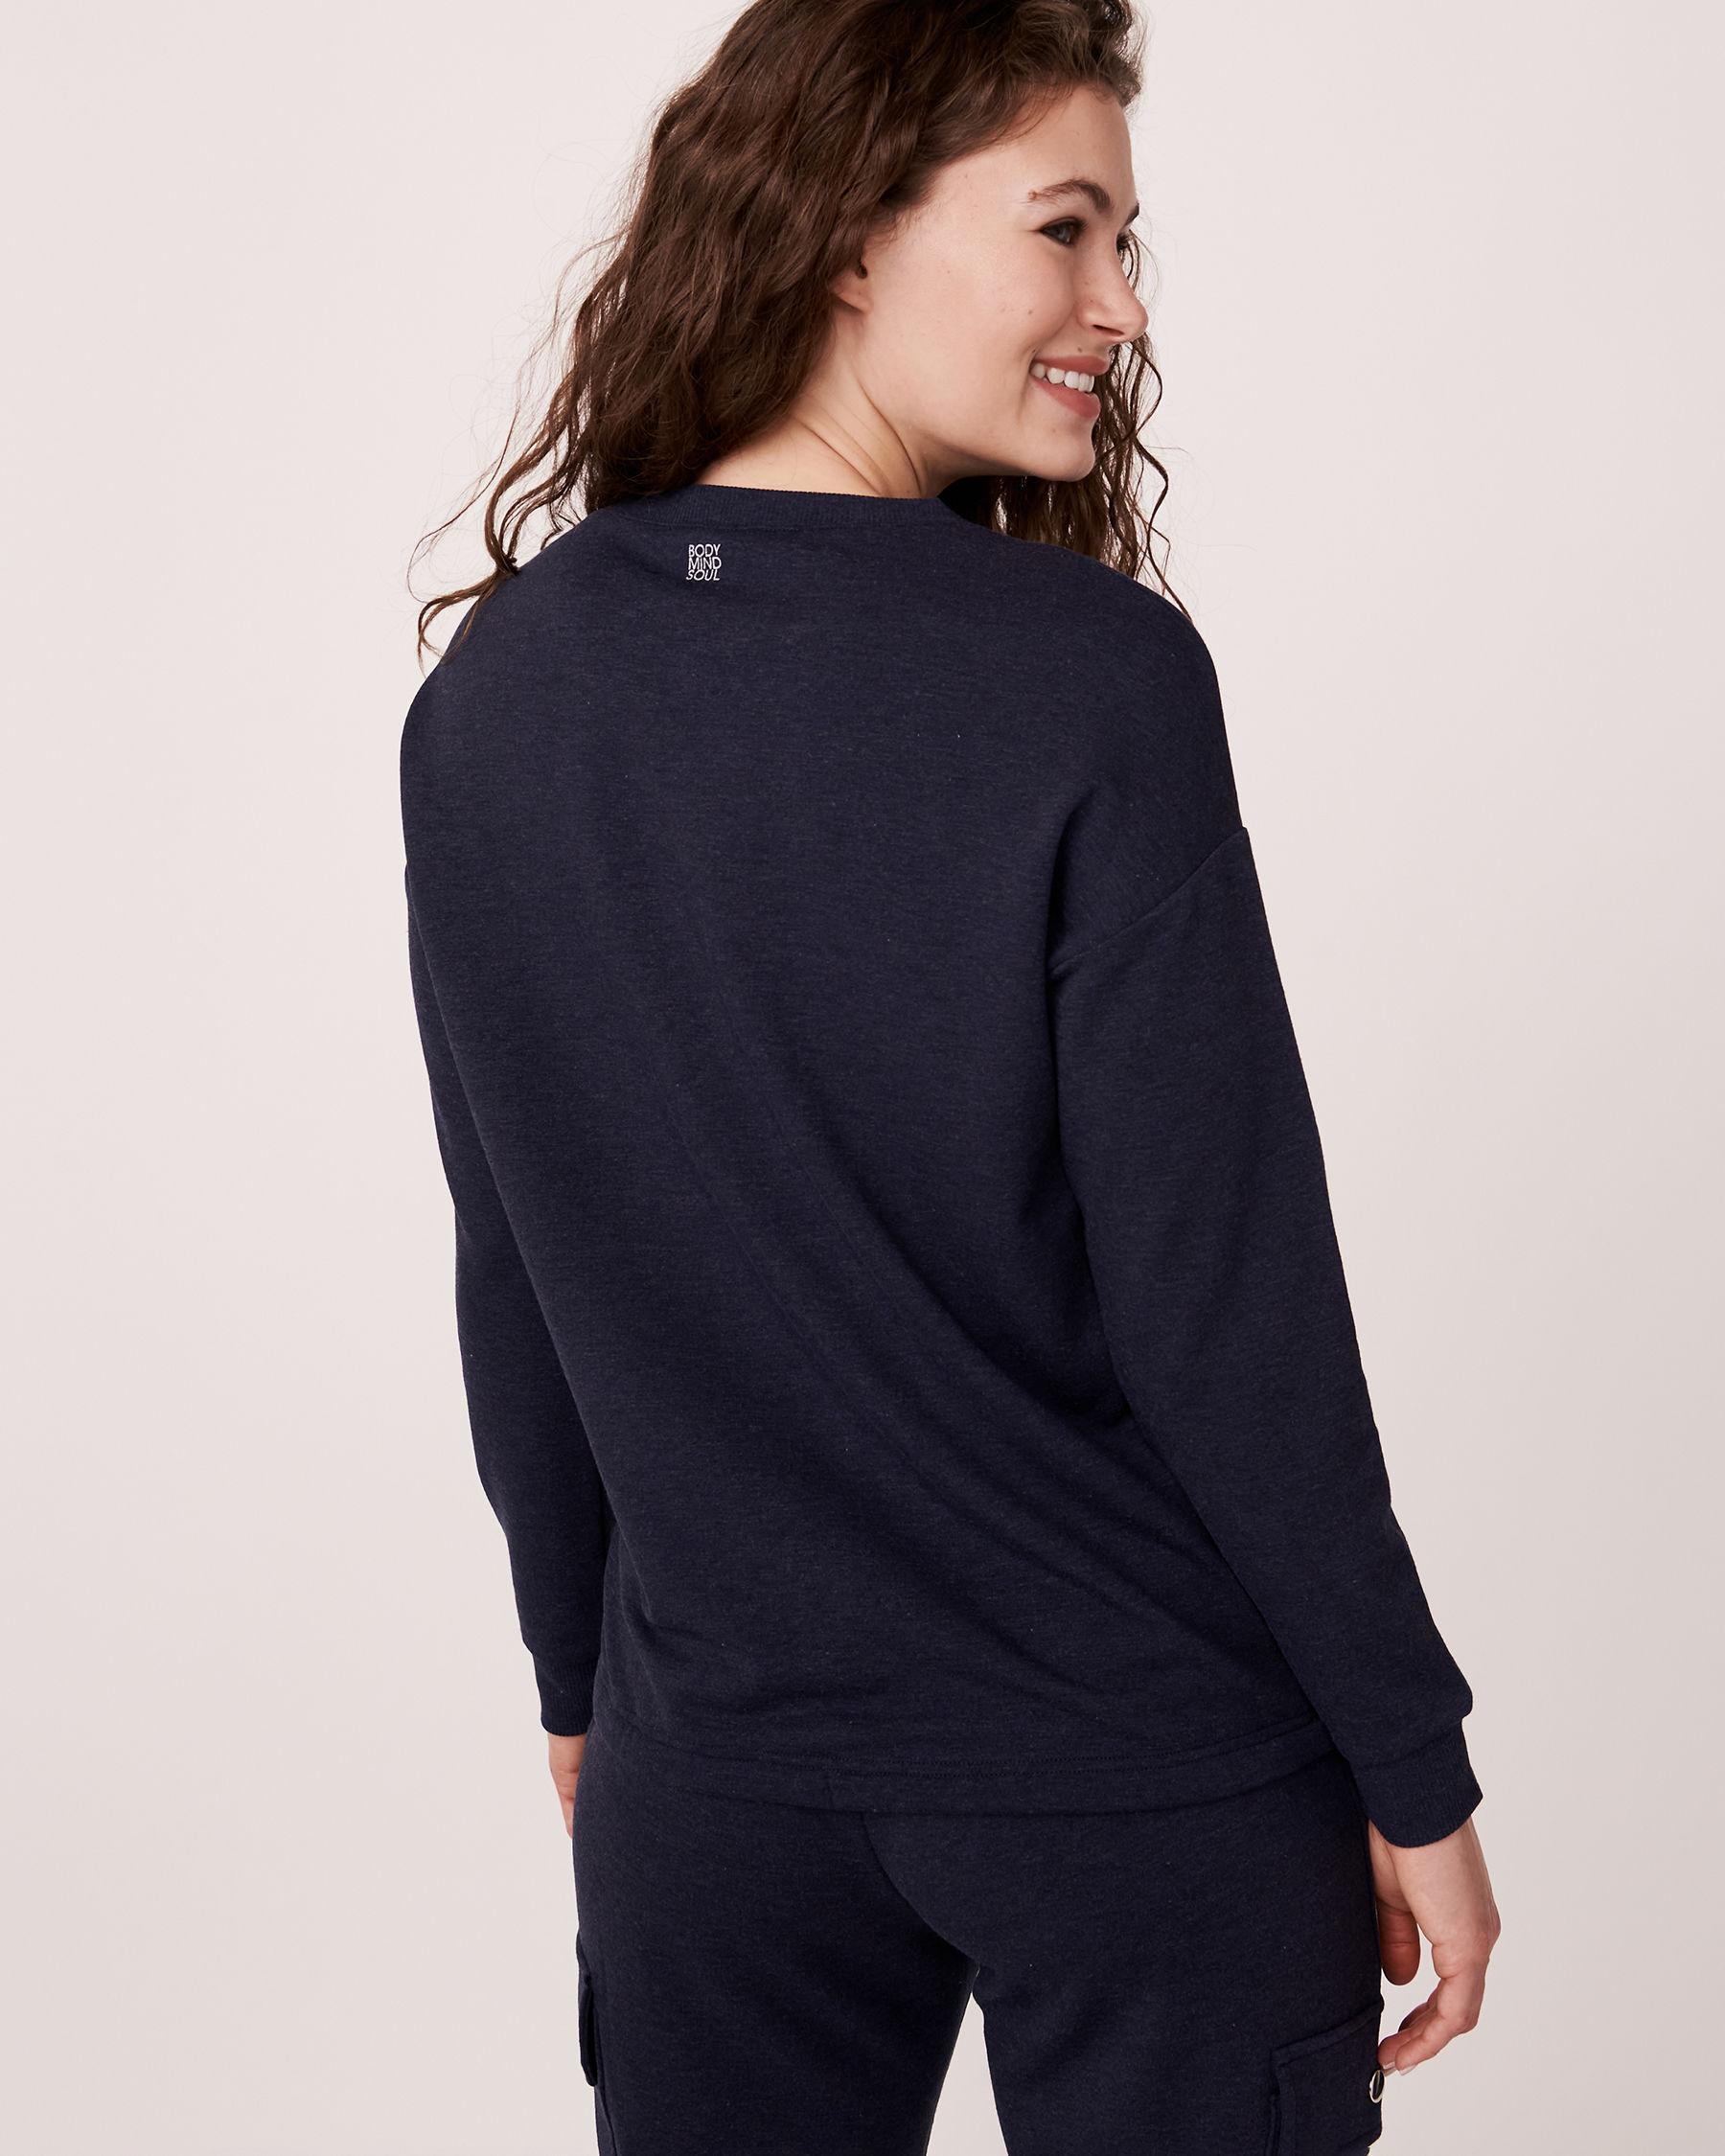 LA VIE EN ROSE Patch Pocket Long Sleeve Shirt Blue 50100004 - View2